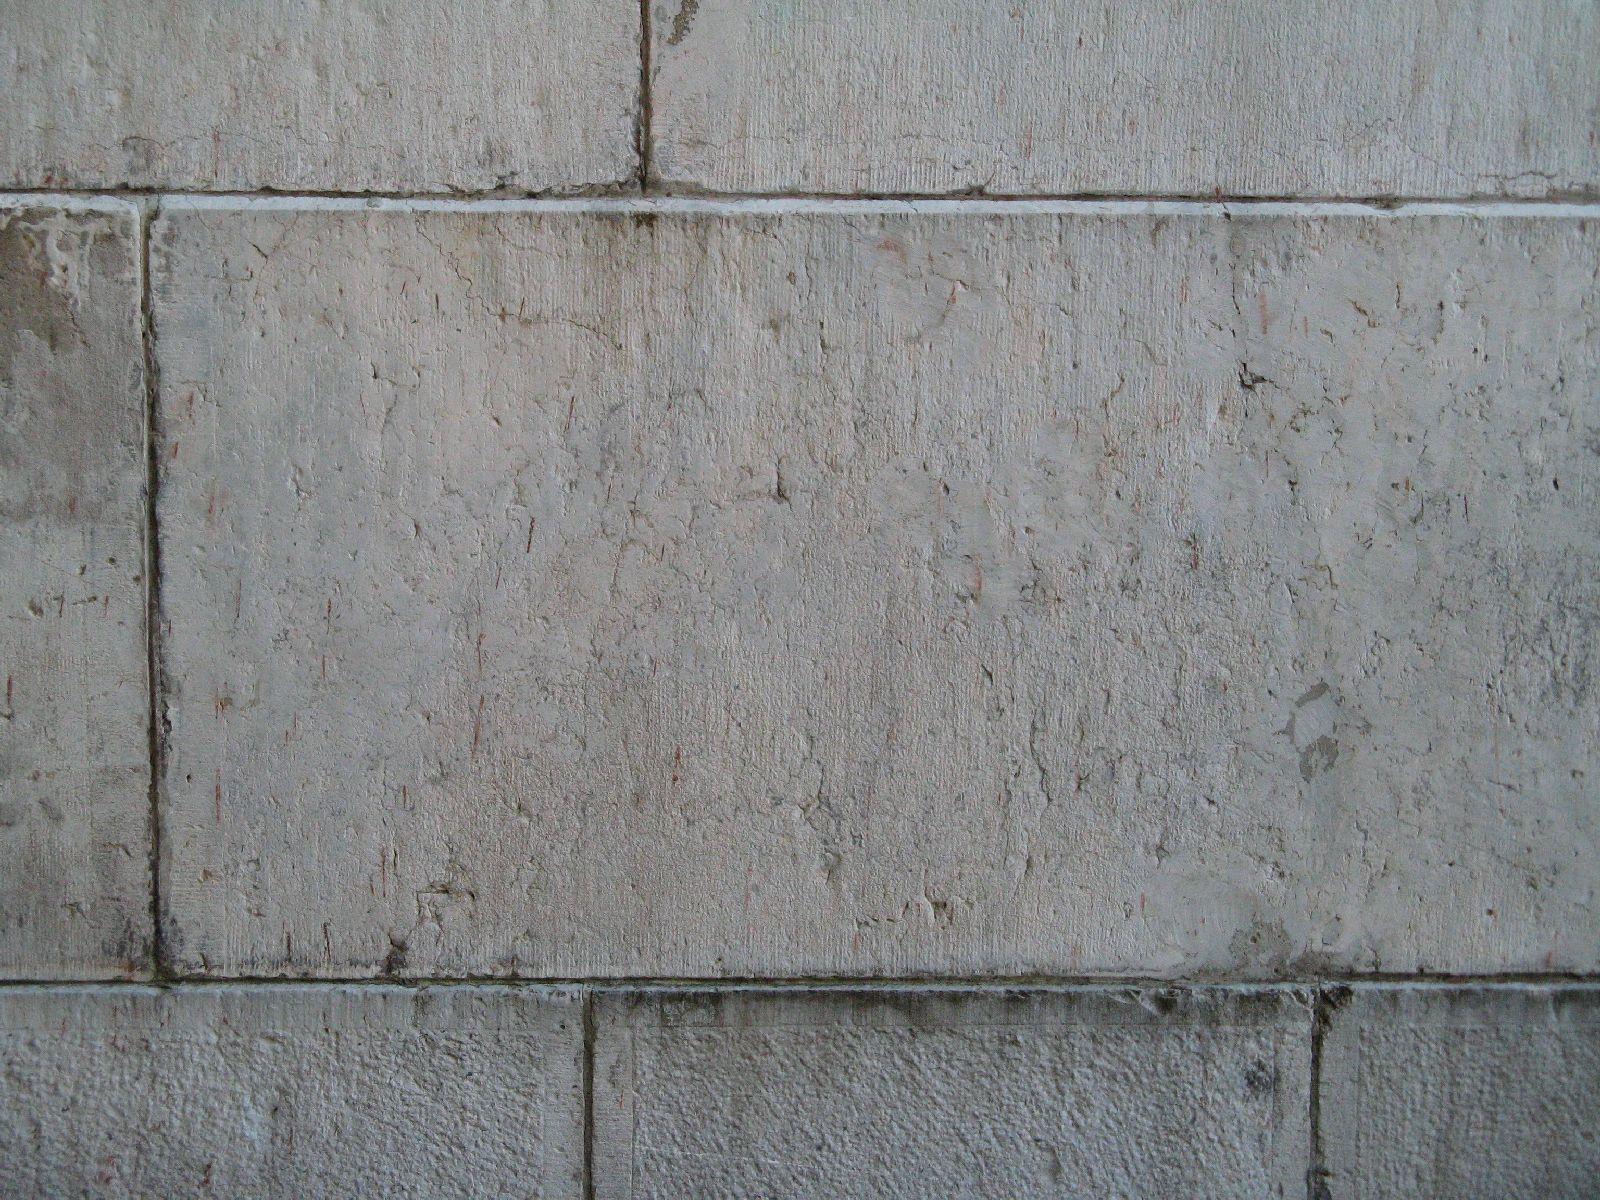 Brick_Texture_B_1063